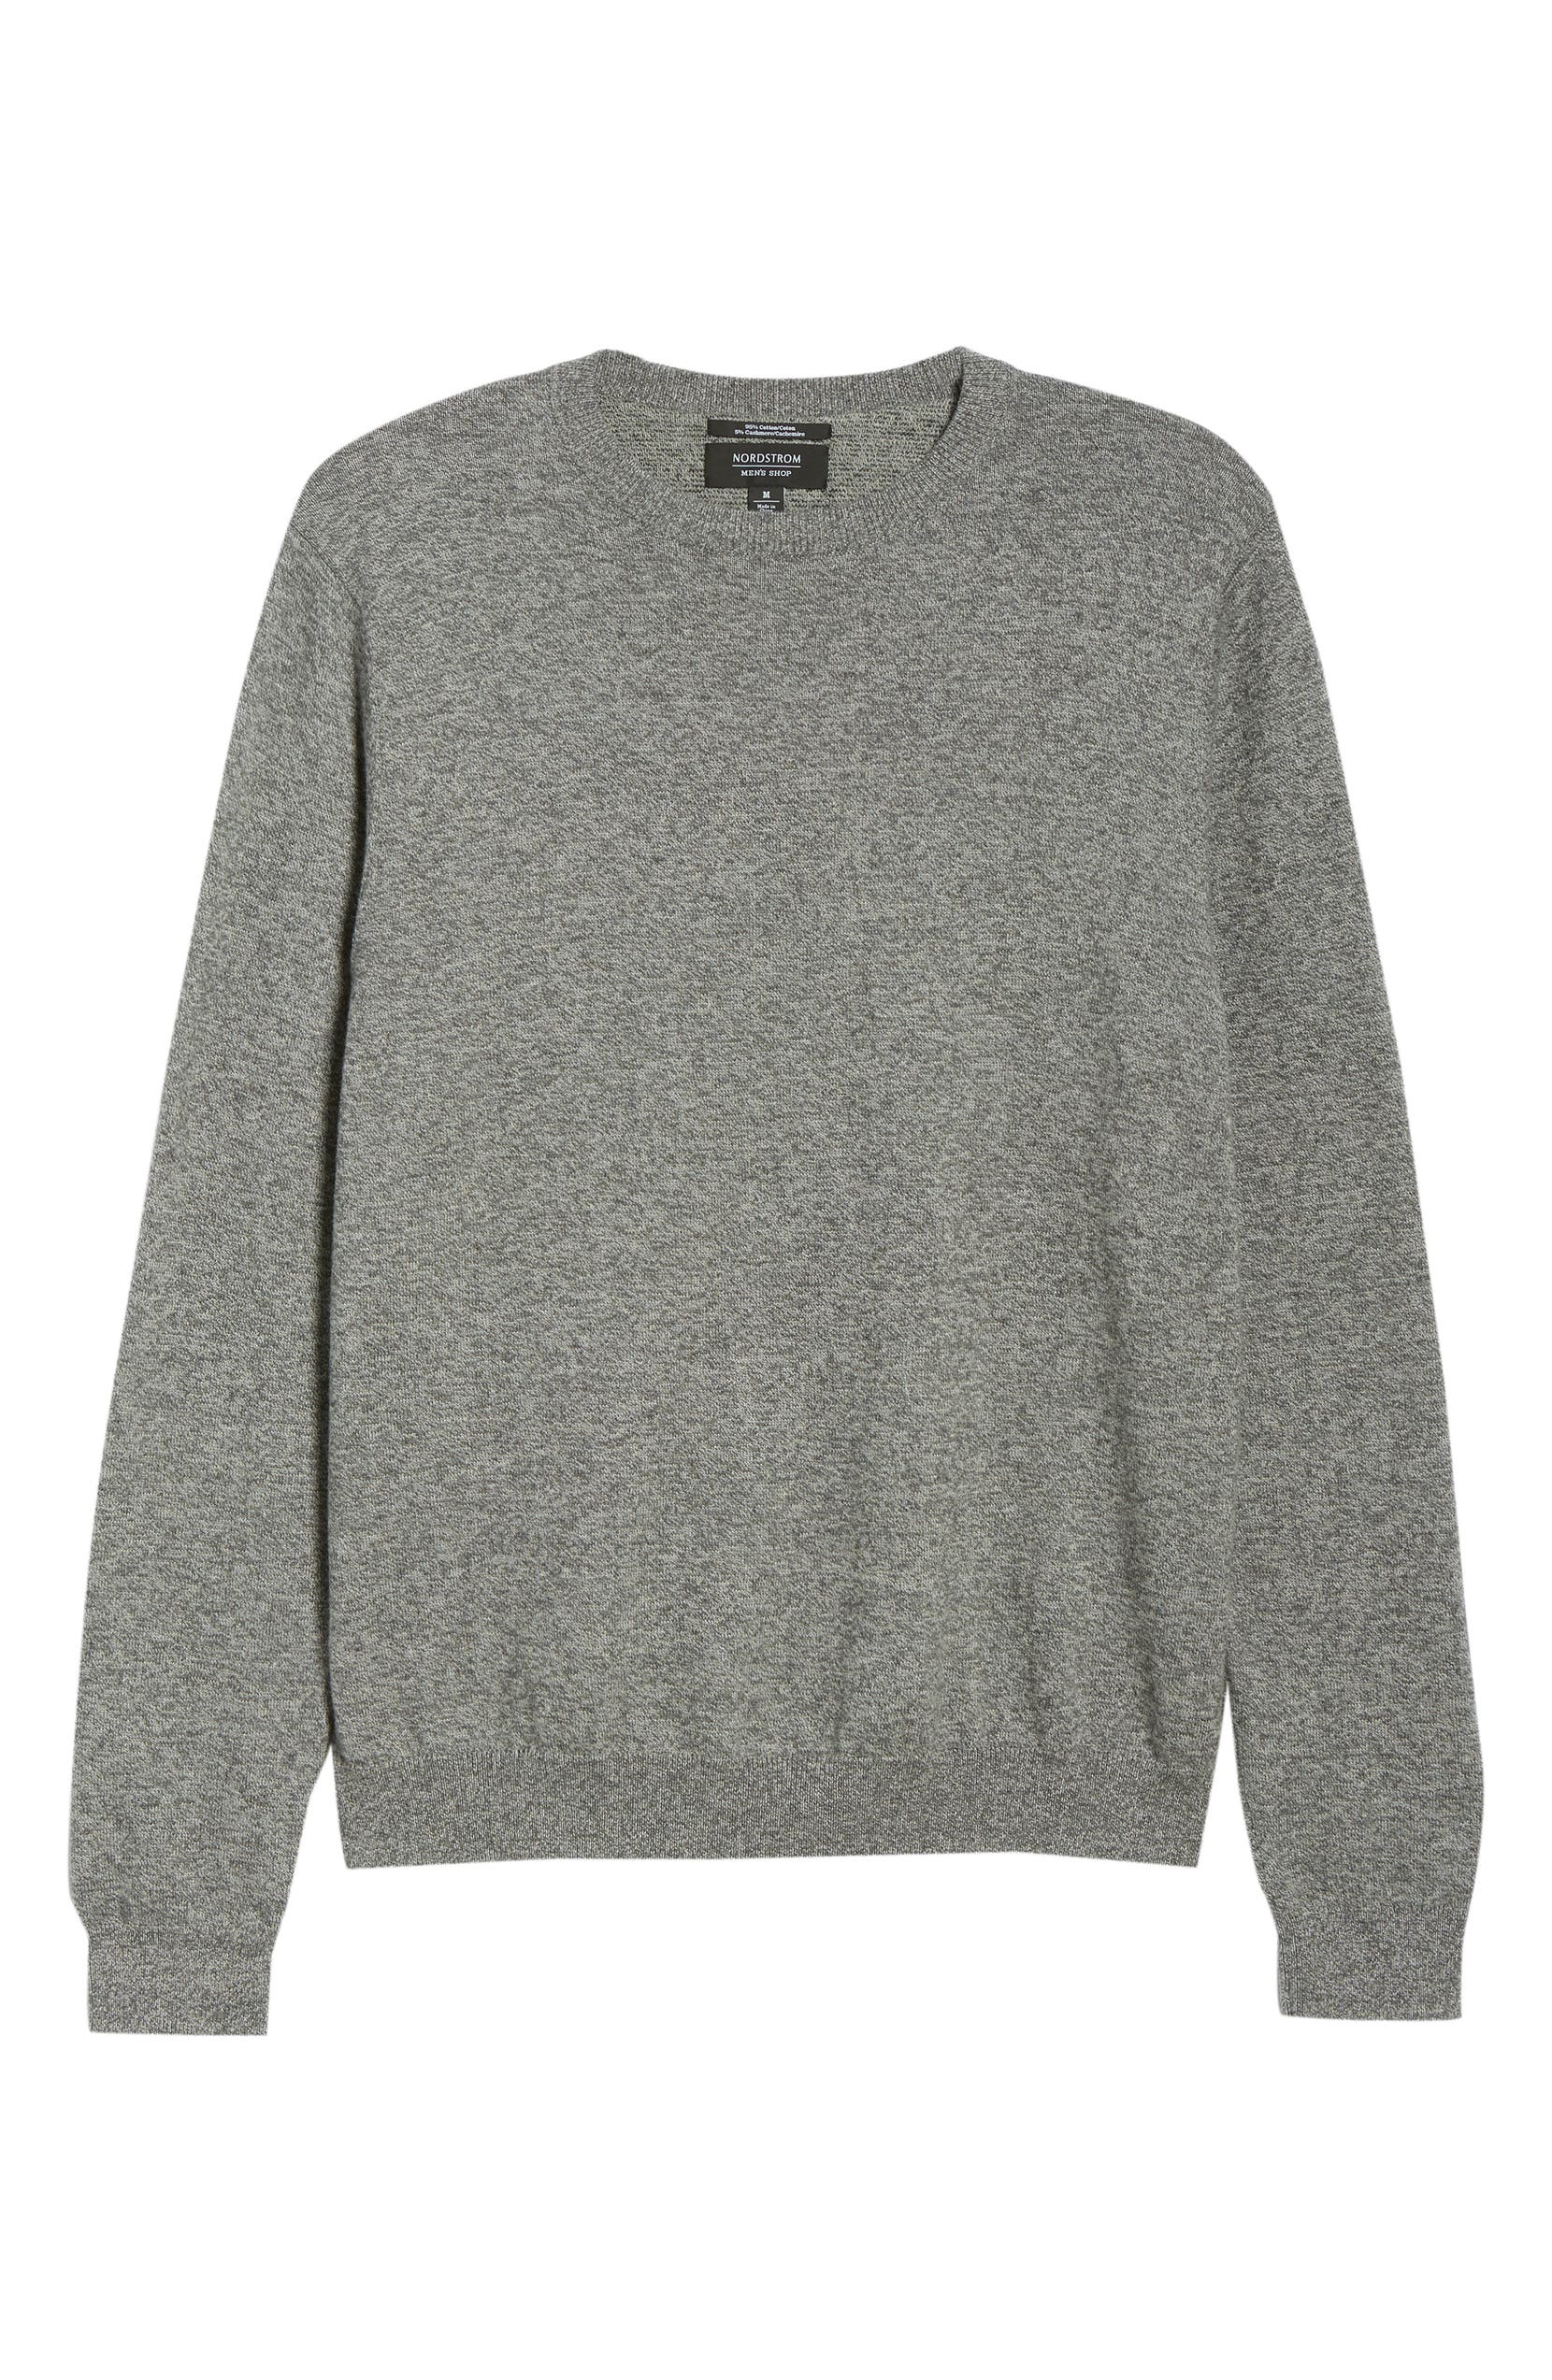 35ab2f3eae0d Shop Crewneck Sweatshirts